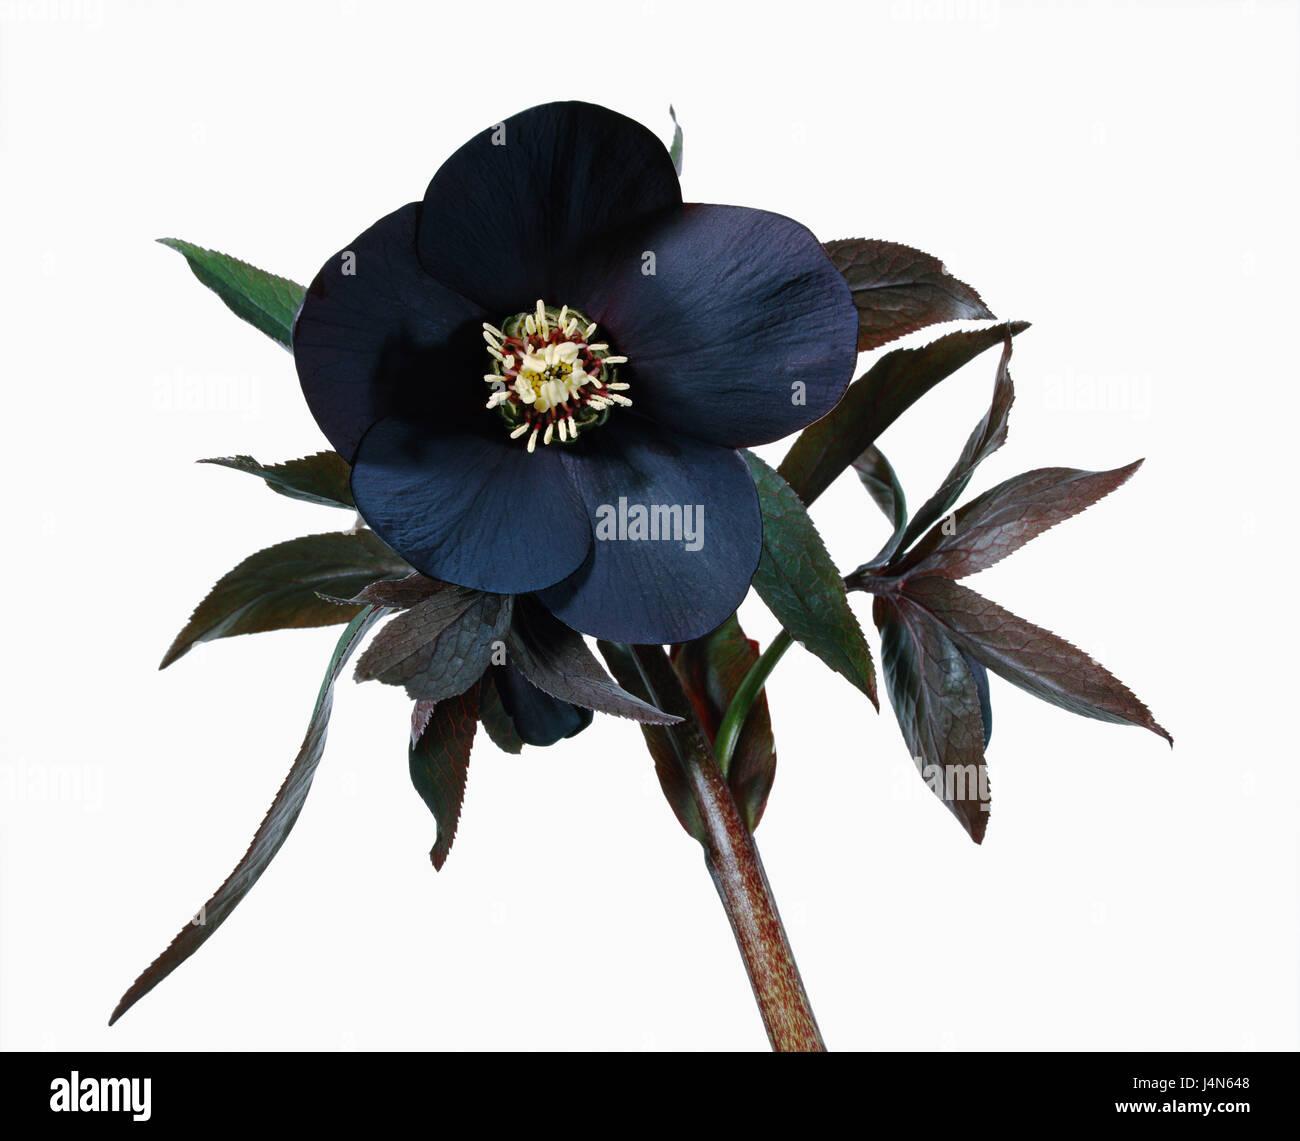 Christmas rose, name: Ballards Hybrid 'John Burbeck', - Stock Image